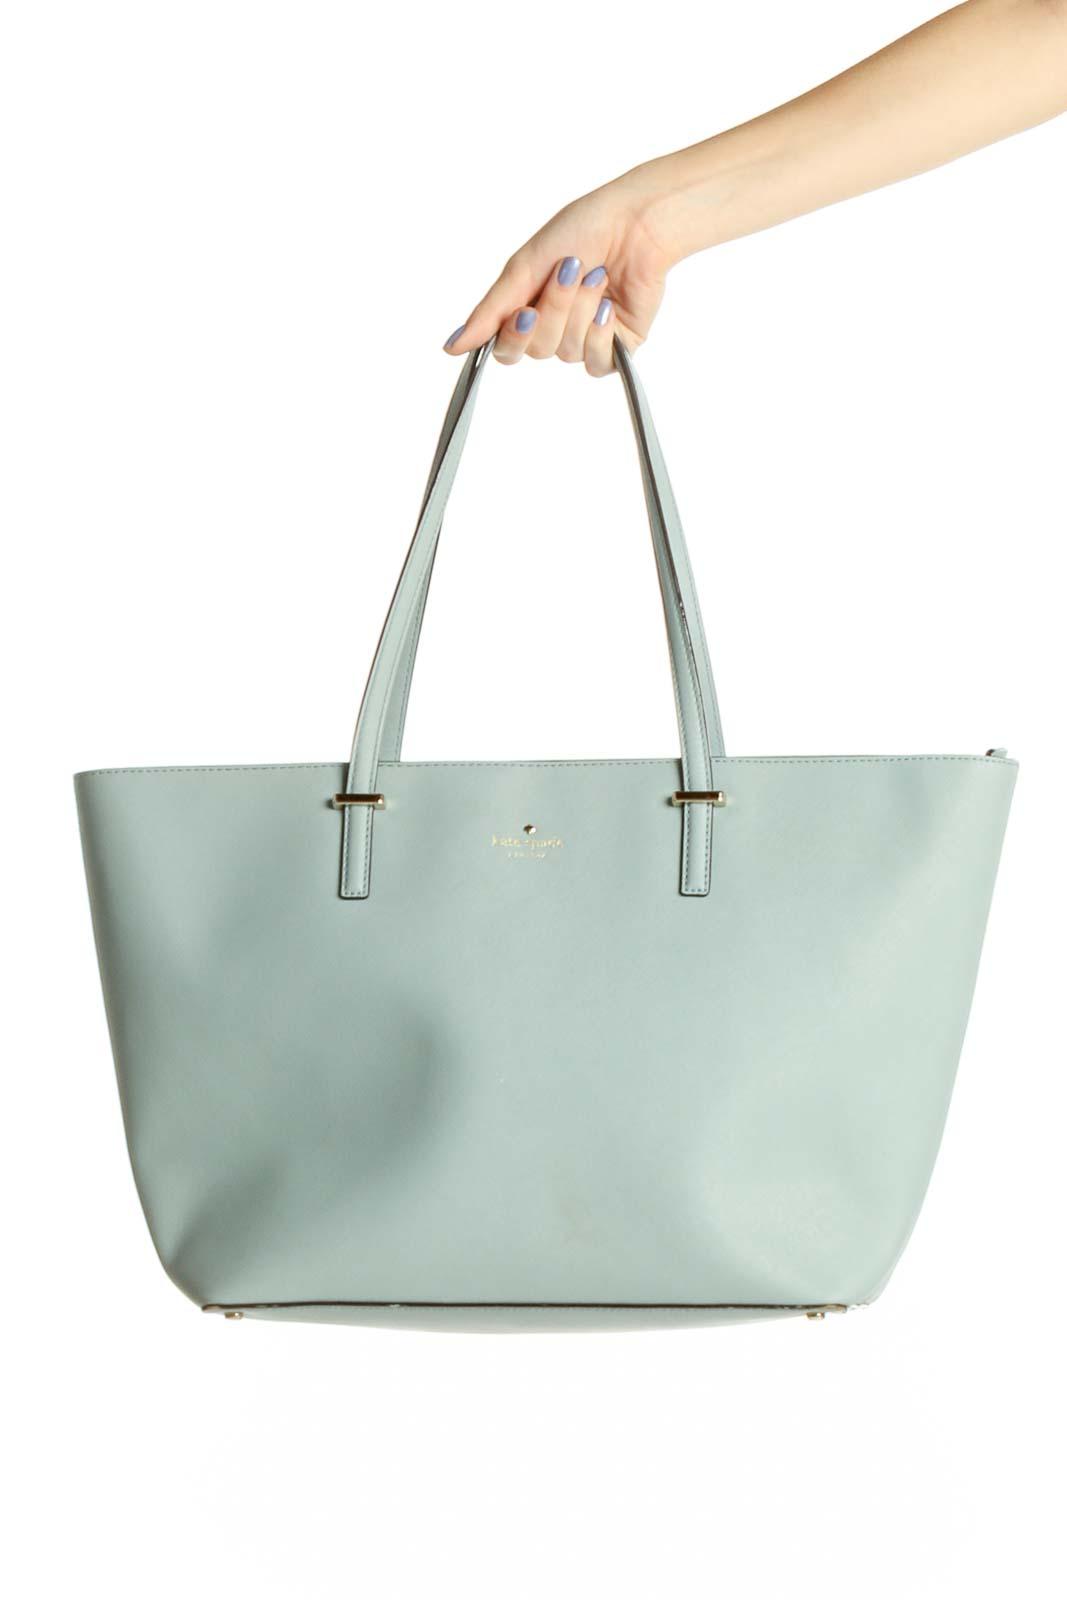 Blue Tote Bag Front